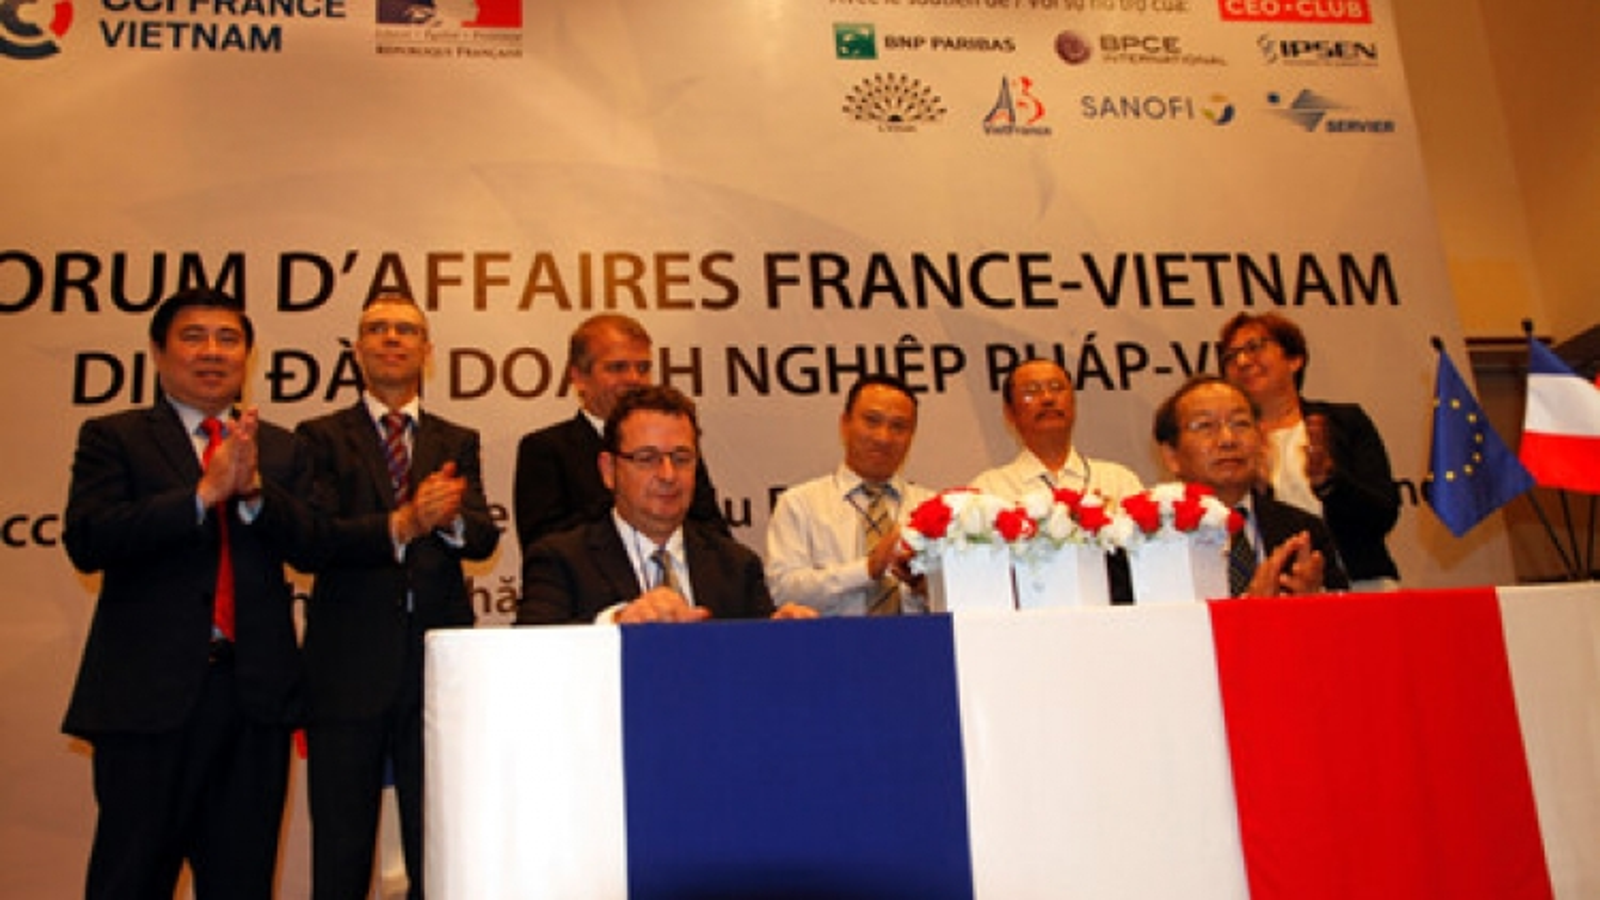 France-Vietnam Business Forum in HCM City